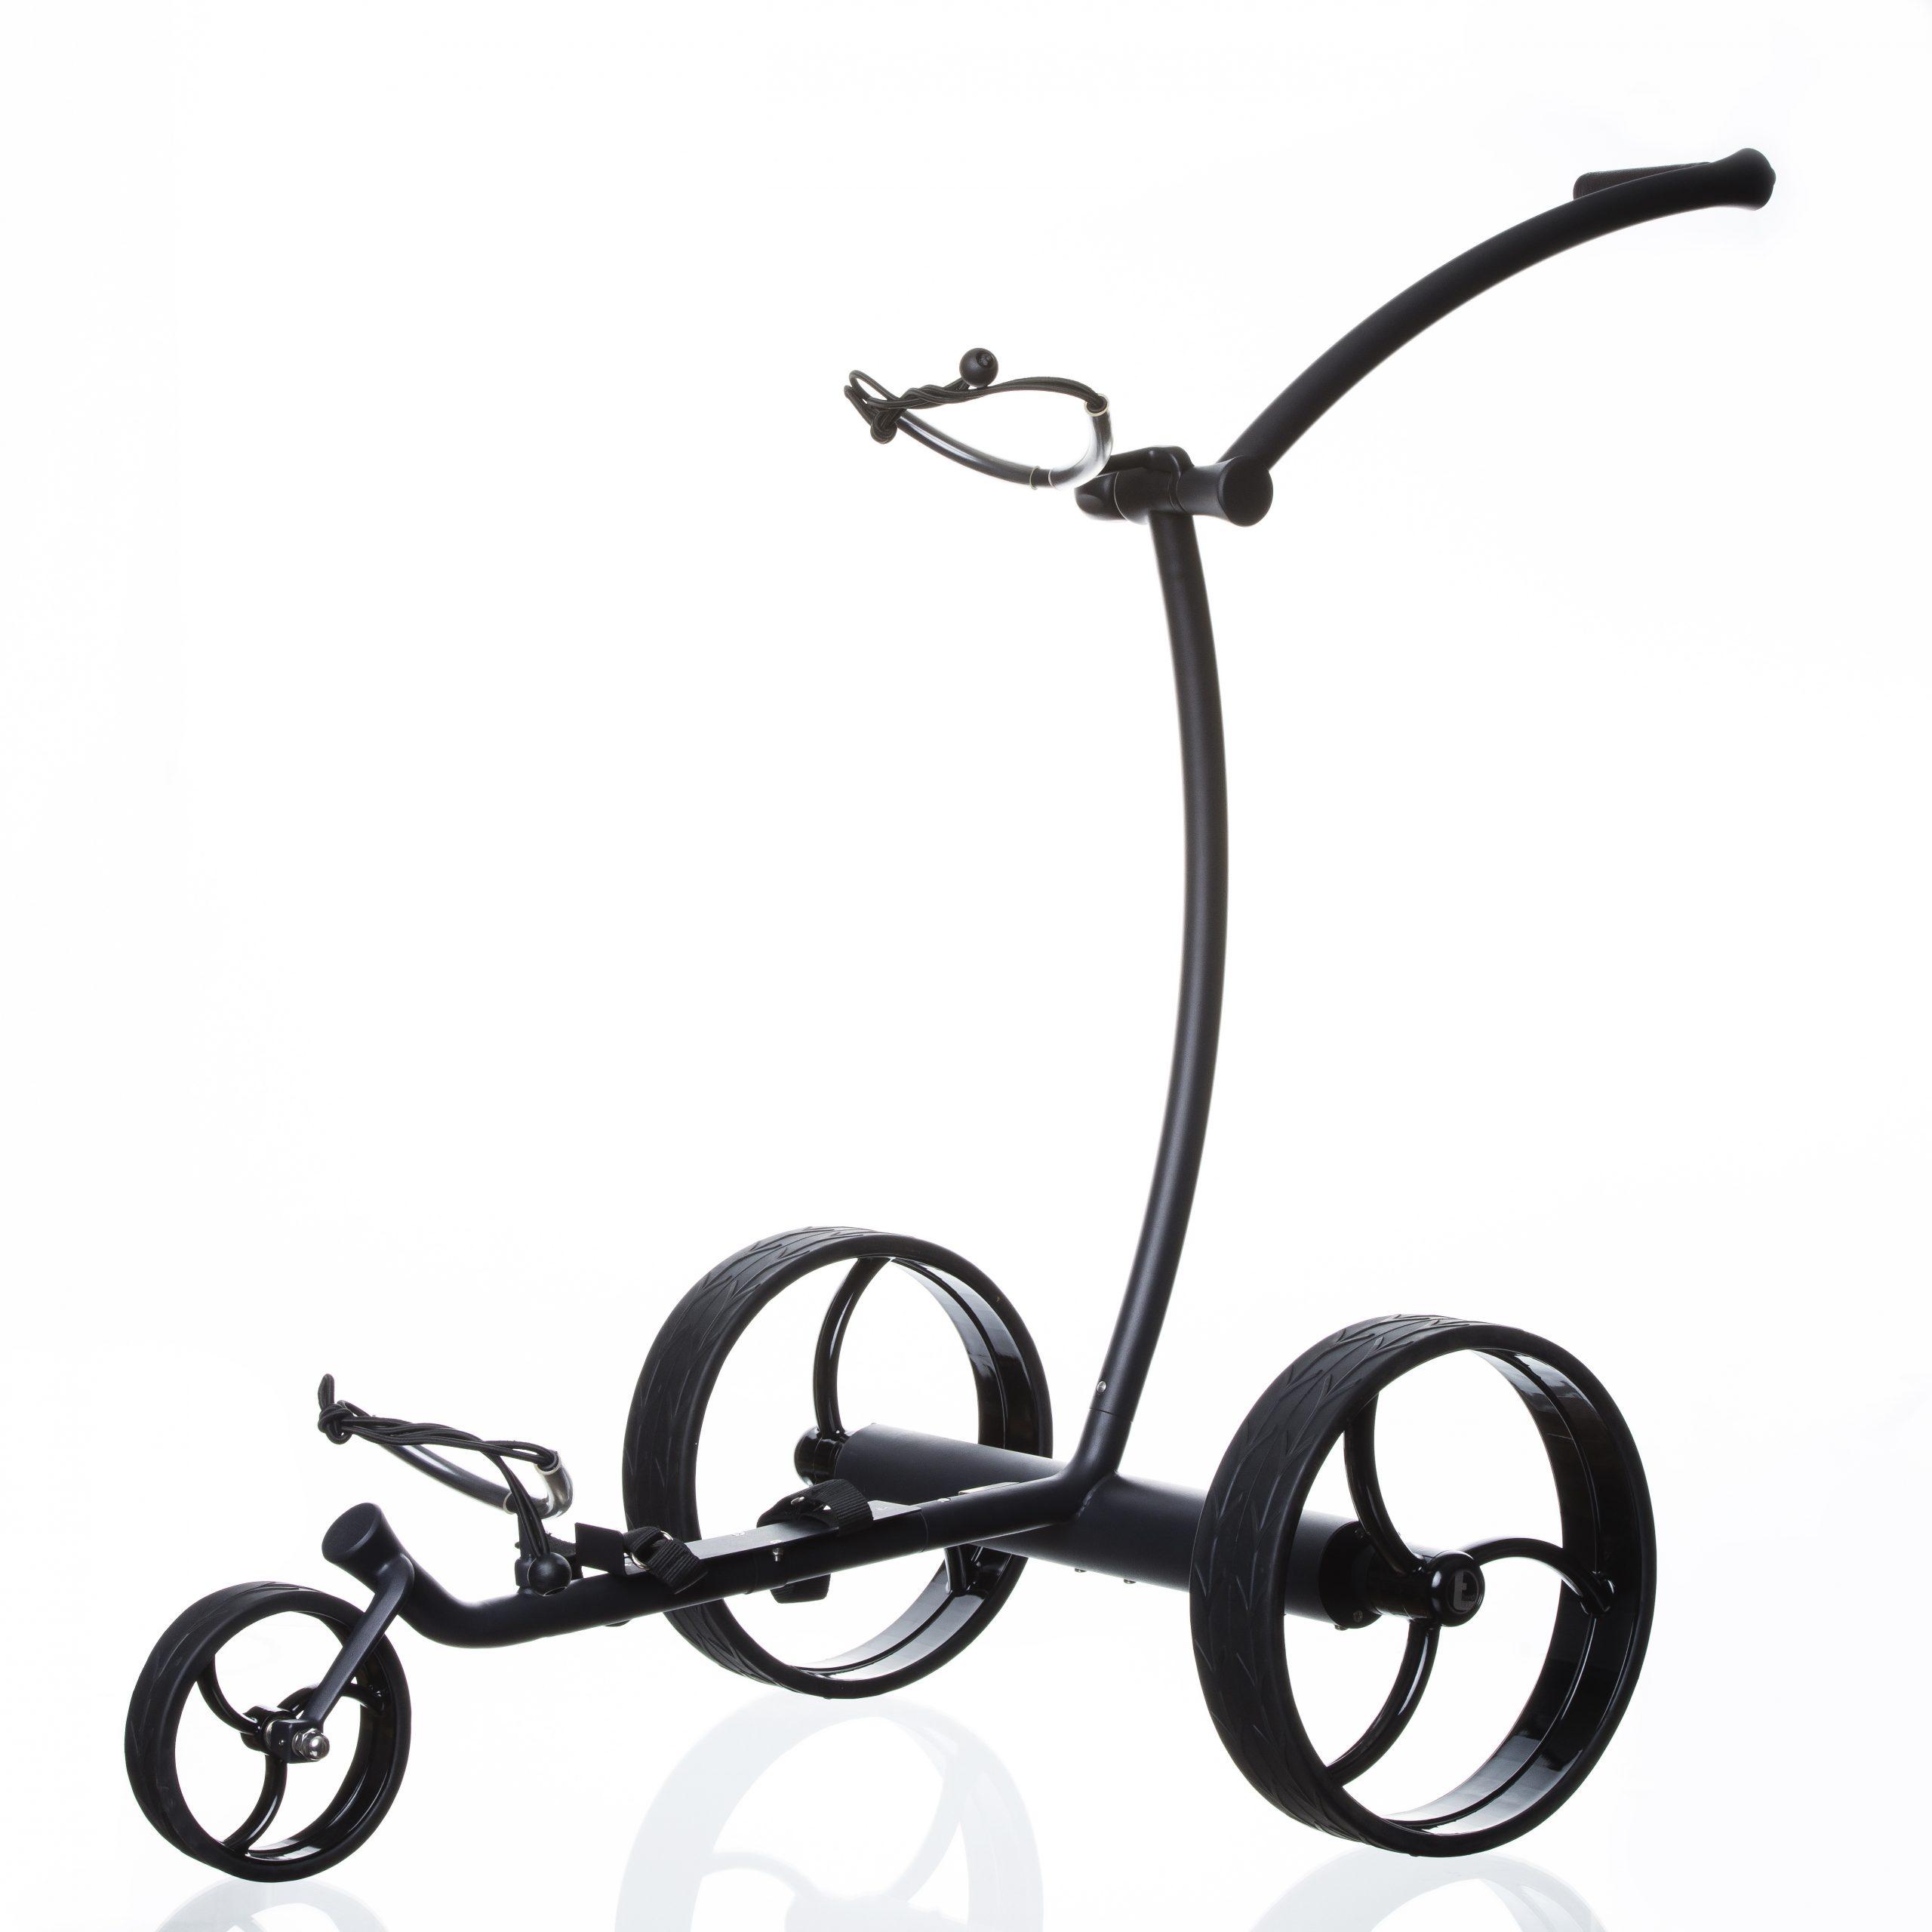 trendGOLF streaker Elektro Golftrolley Edelstahl schwarz